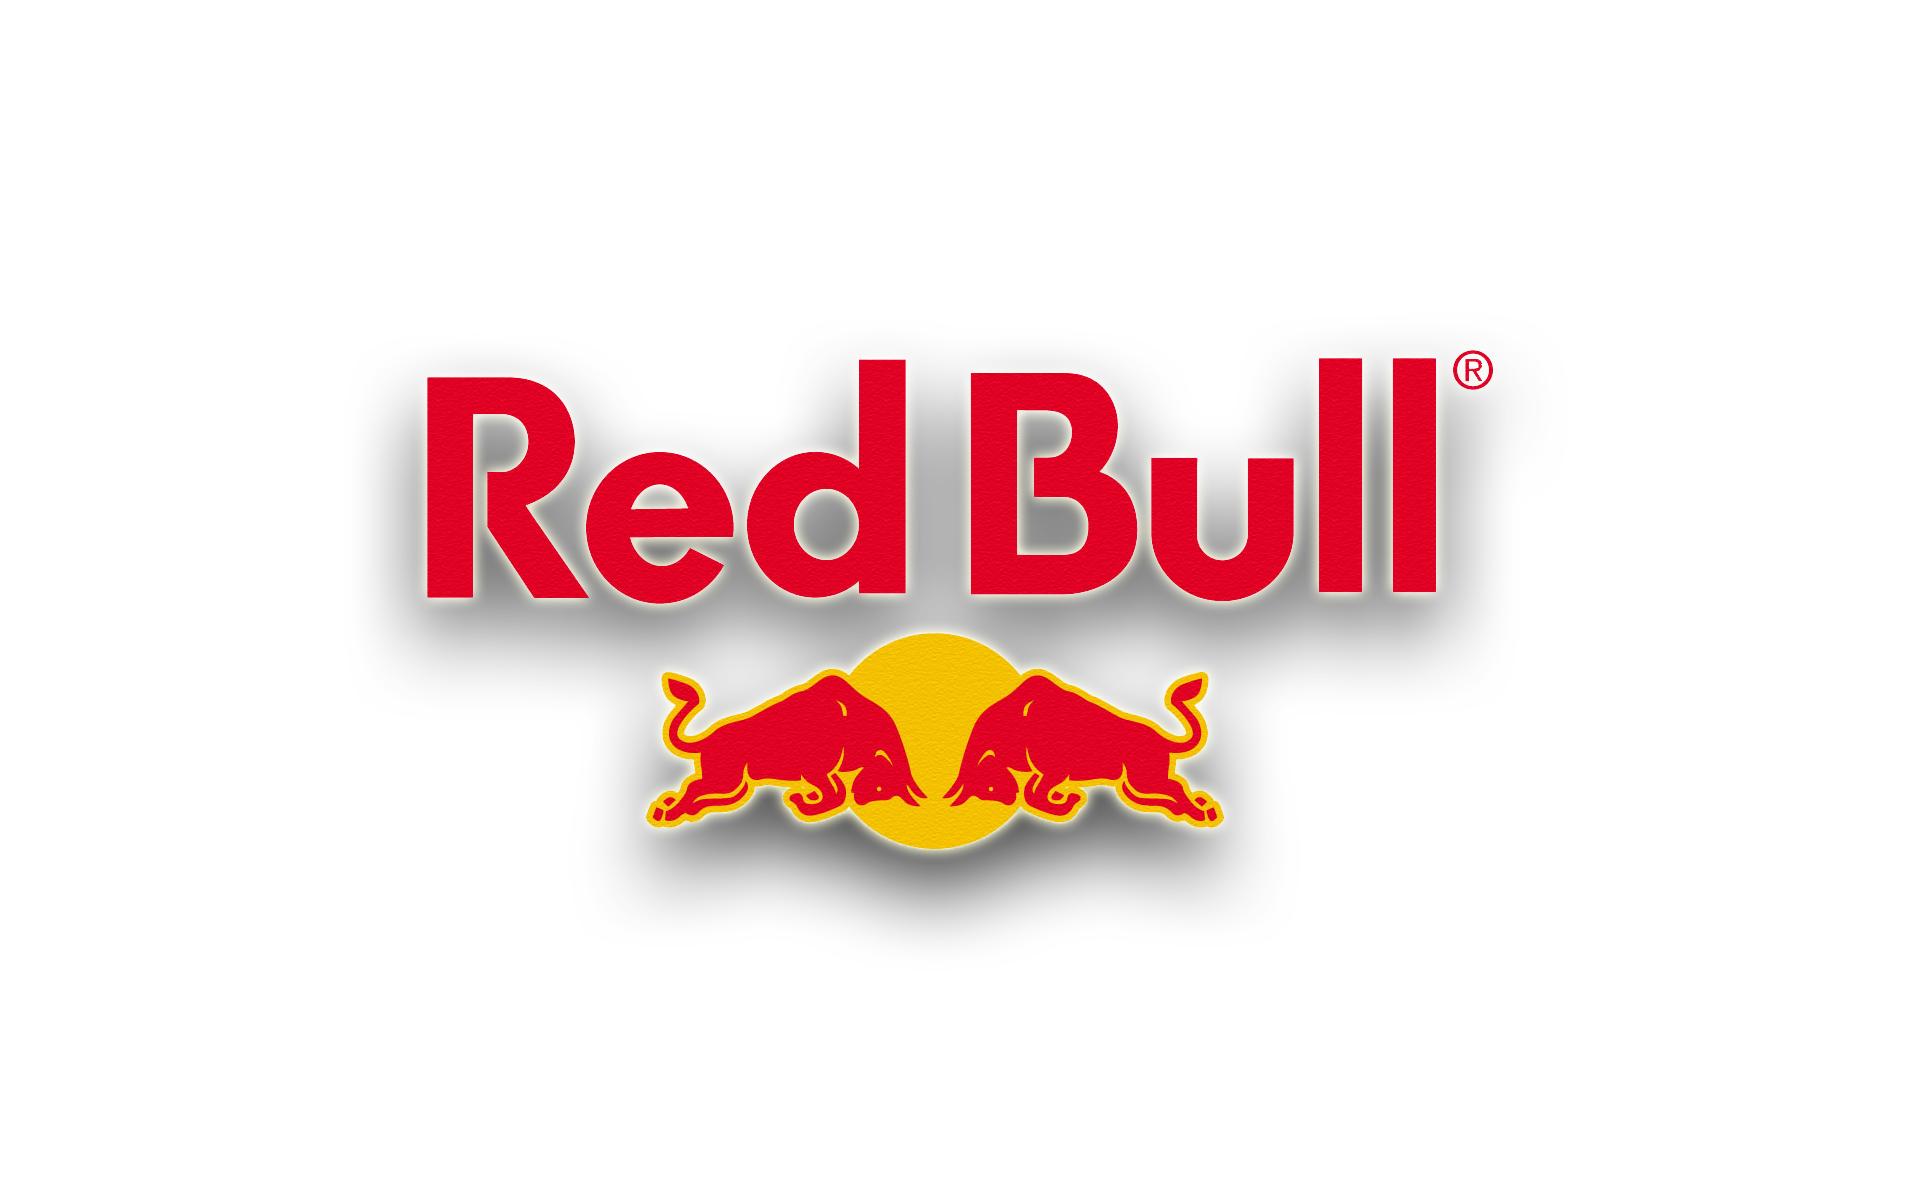 Hipster Fall Desktop Wallpaper Red Bull Logo Hd Backgrounds Pixelstalk Net